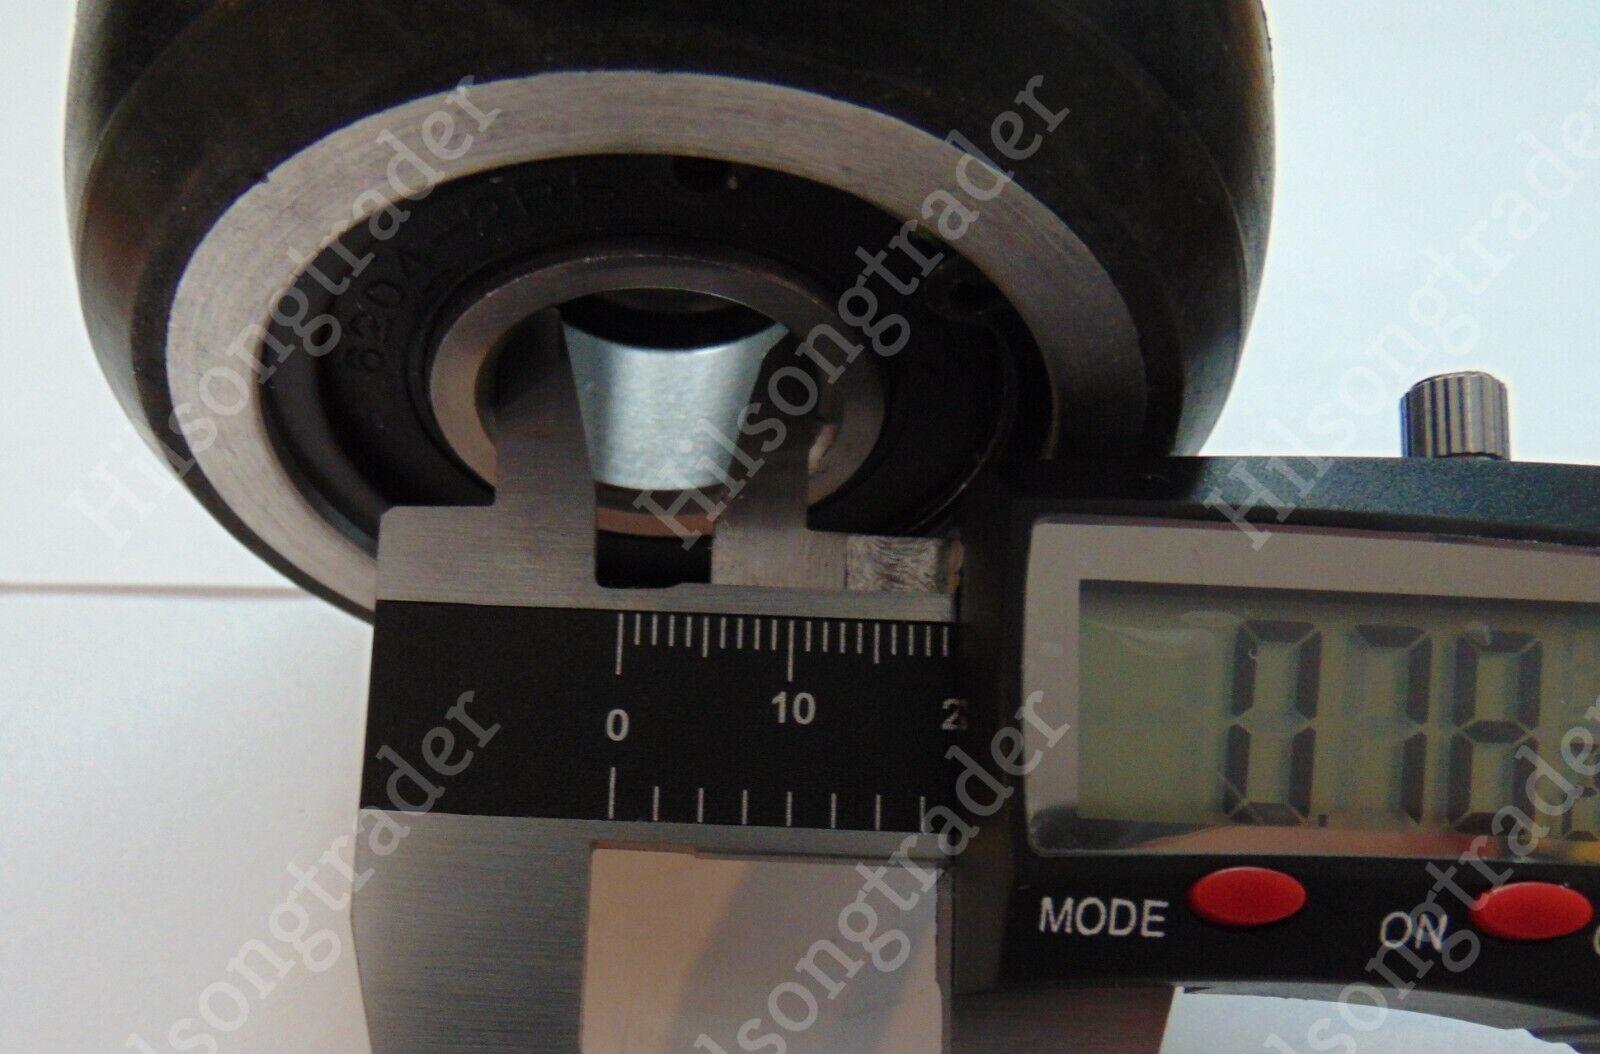 NTEL59011 Part # 6035933 or 6089056 NordicTrack CXT 910 Elliptical Wheel  Model